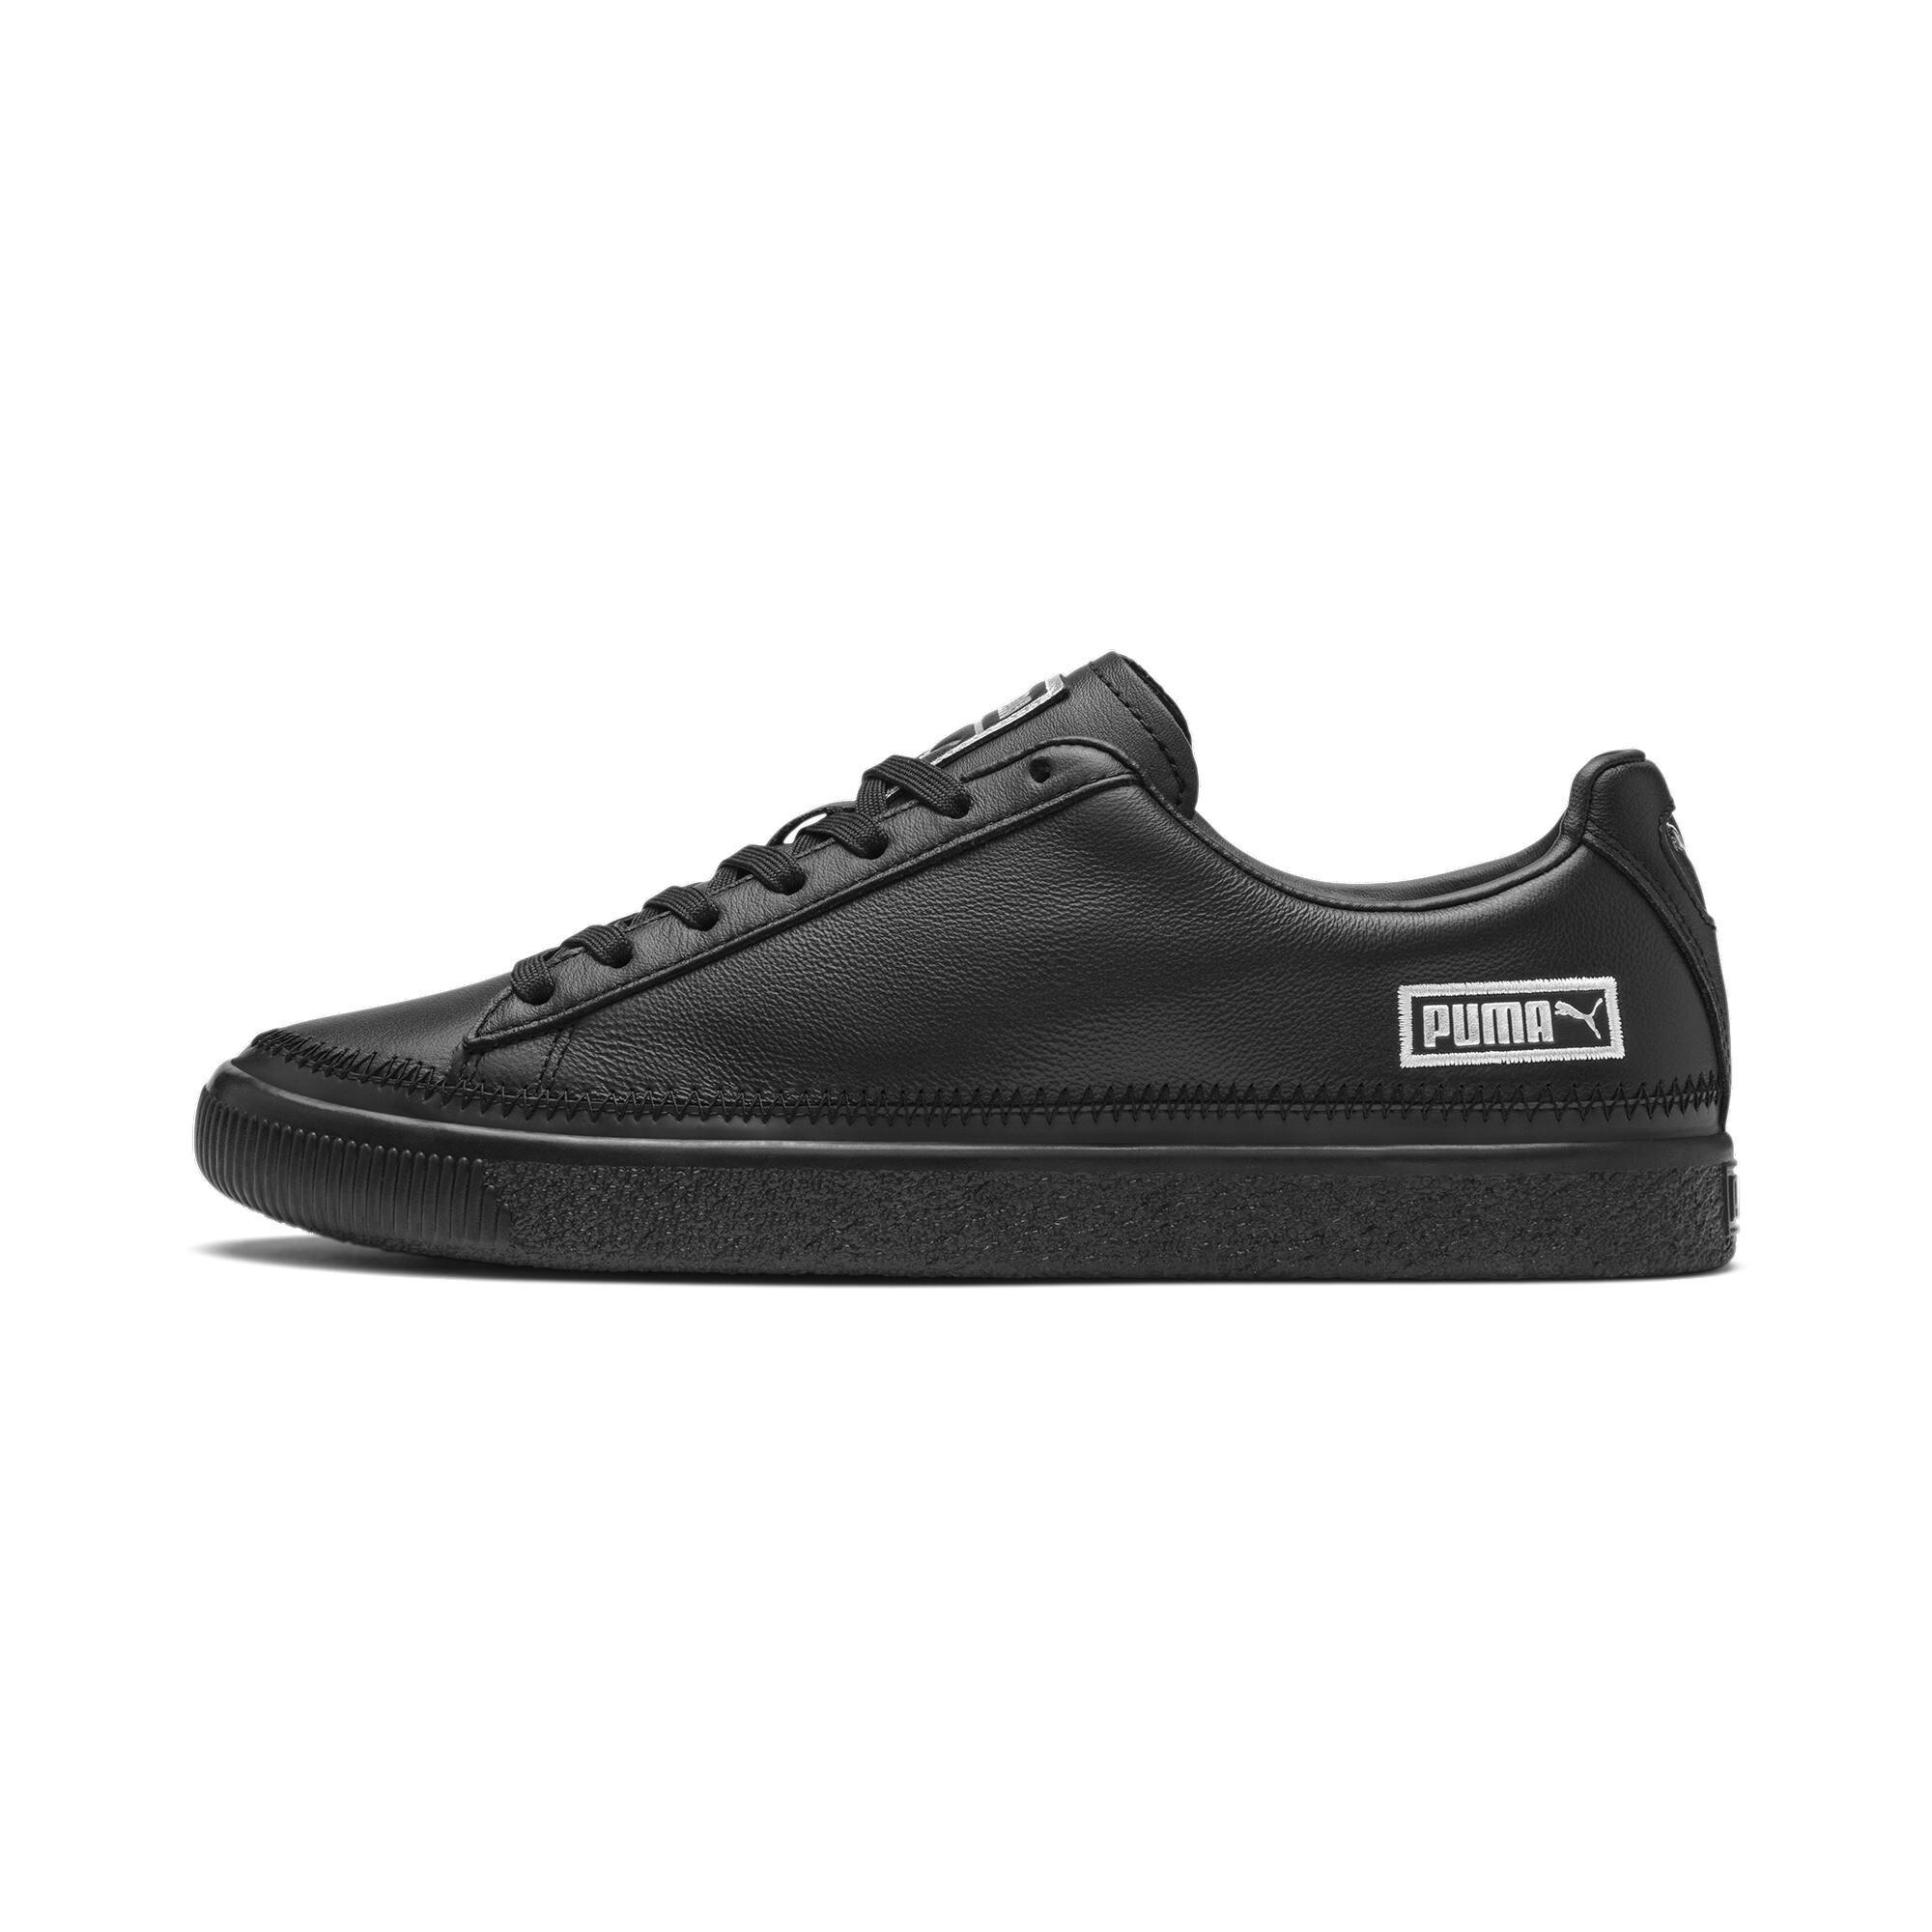 Indexbild 10 - PUMA Basket Stitch Sneaker Unisex Schuhe Neu